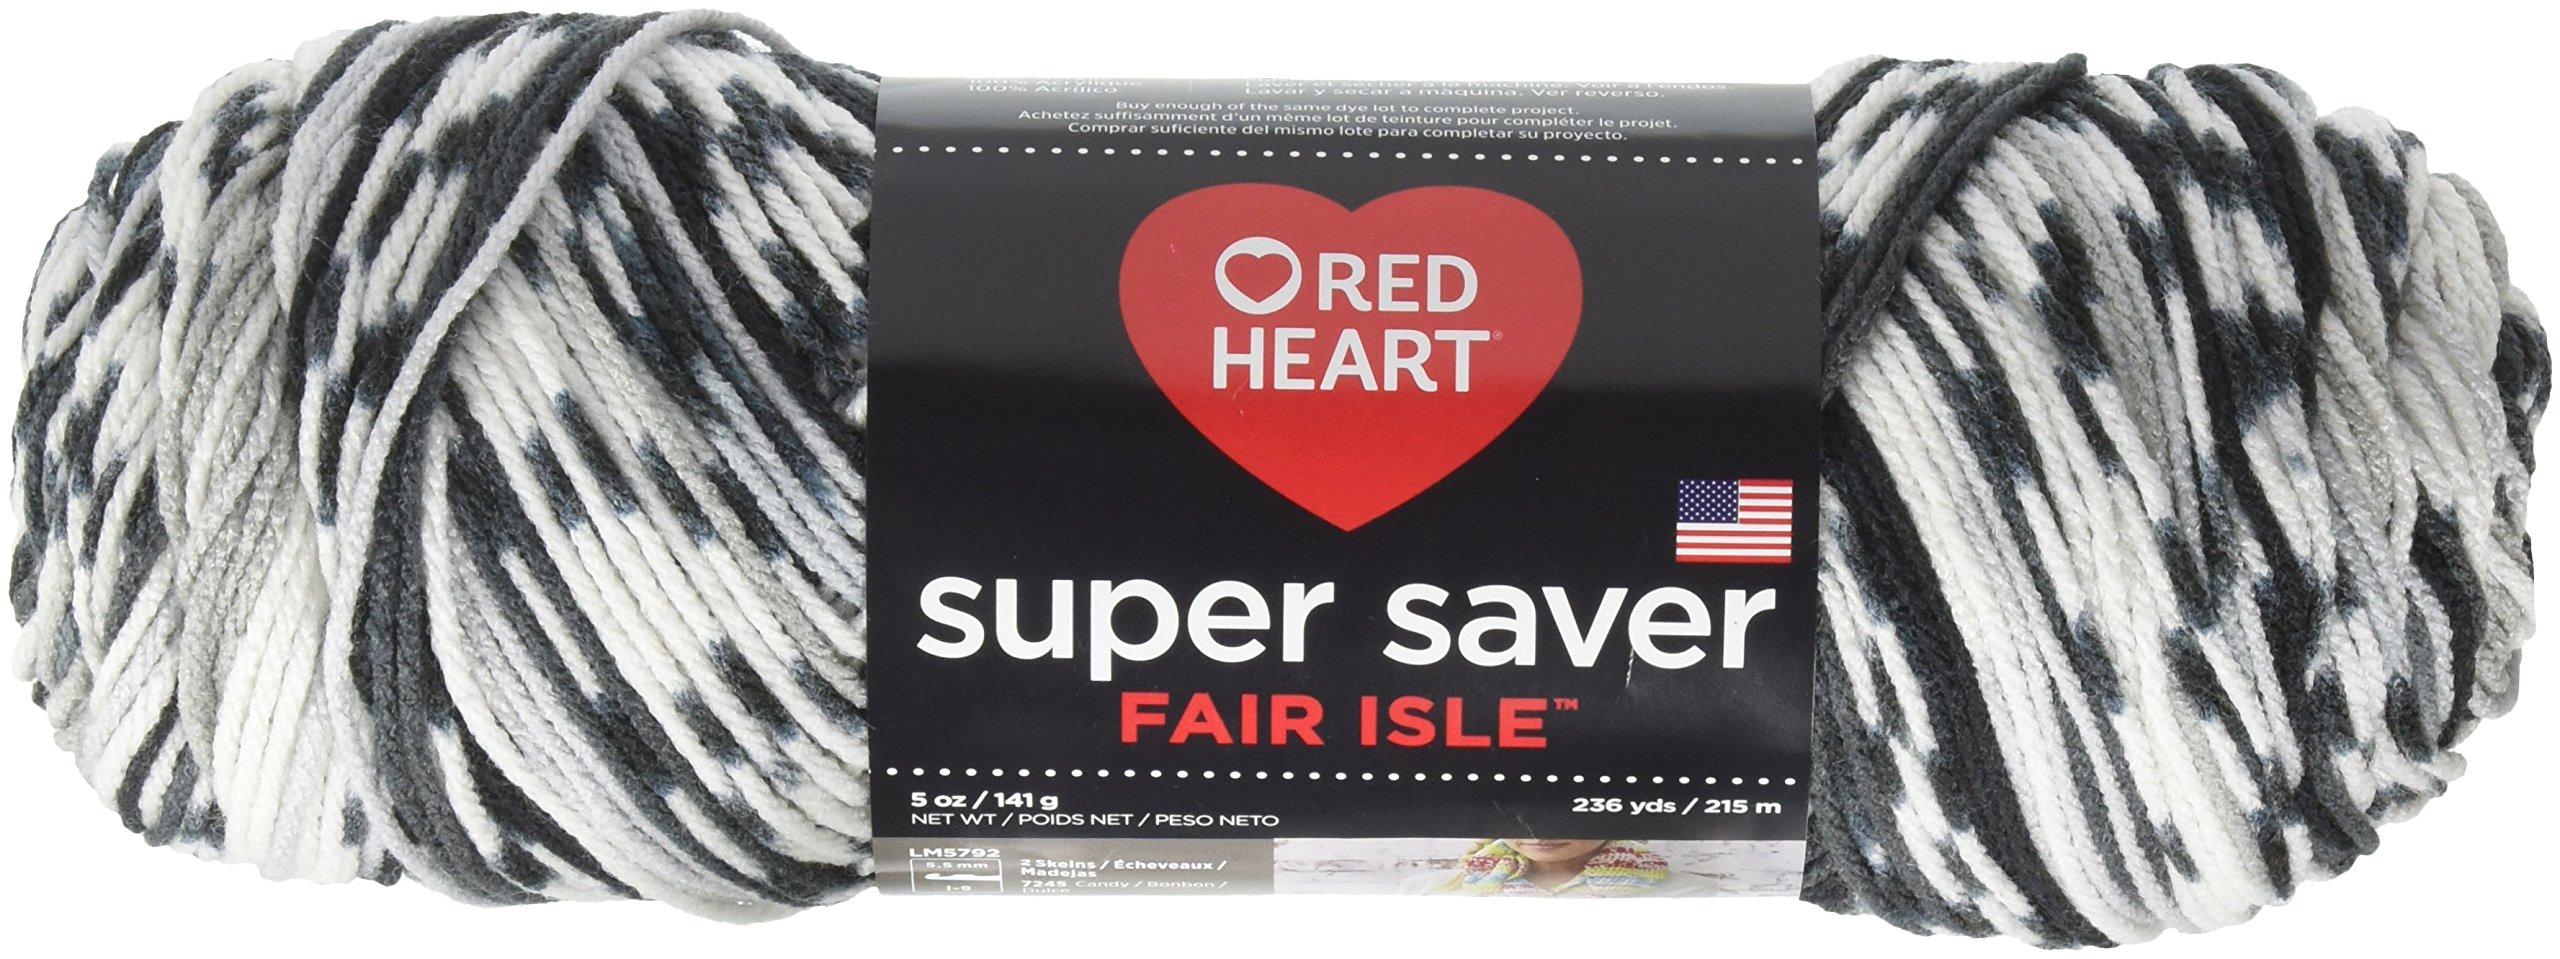 Red Heart Super Saver Yarn, Fair Isle - Newspaper